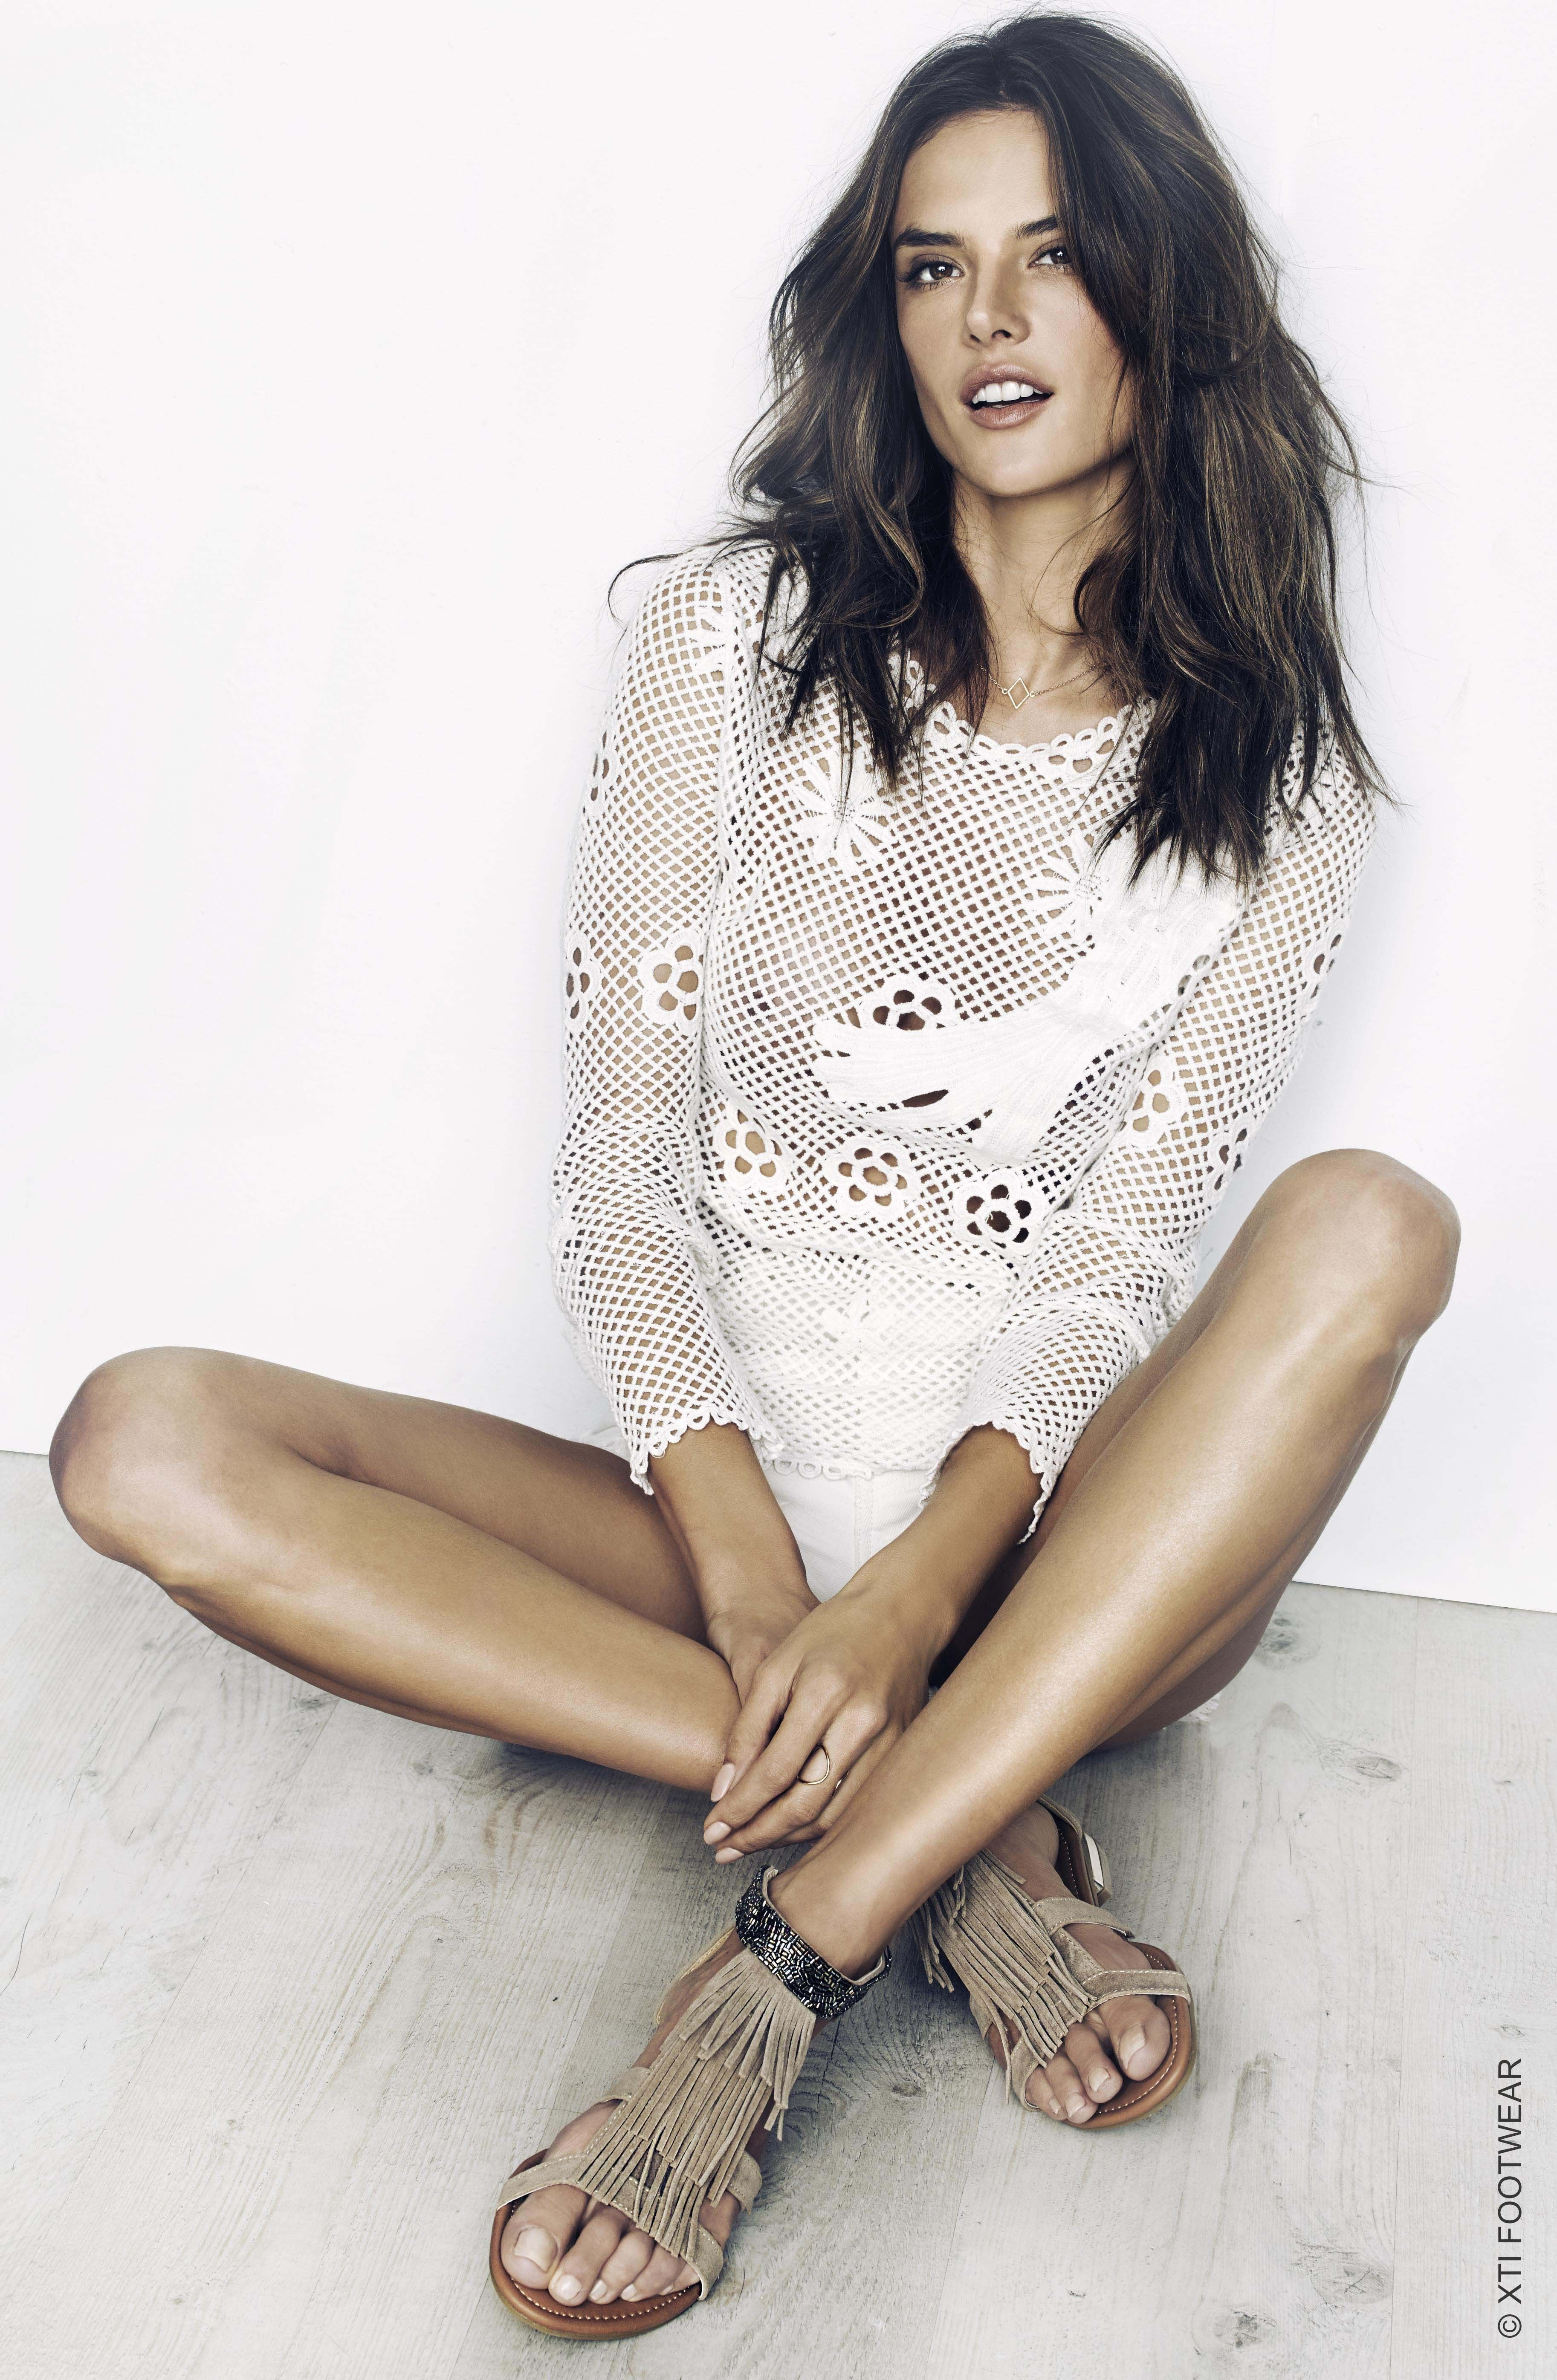 Alessandra Ambrosio s Feet    wikiFeet   A Weeklyfeet program ... 7fe3989743ec